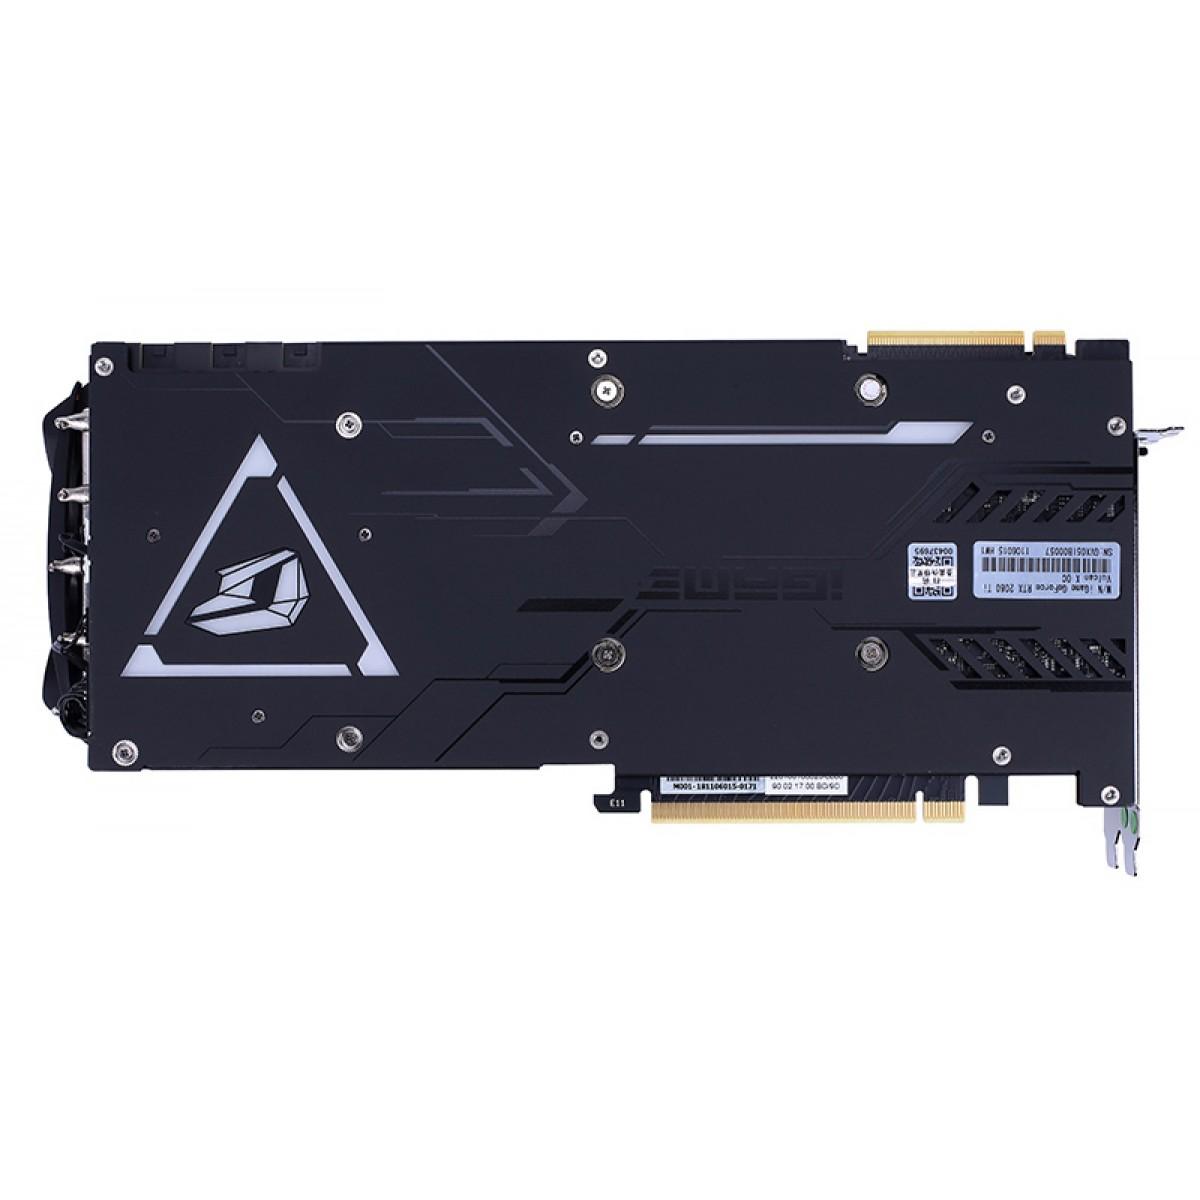 Placa de Vídeo Colorful iGame Geforce RTX 2080 Ti Vulcan X OC, 11GB GDDR6, 352Bit